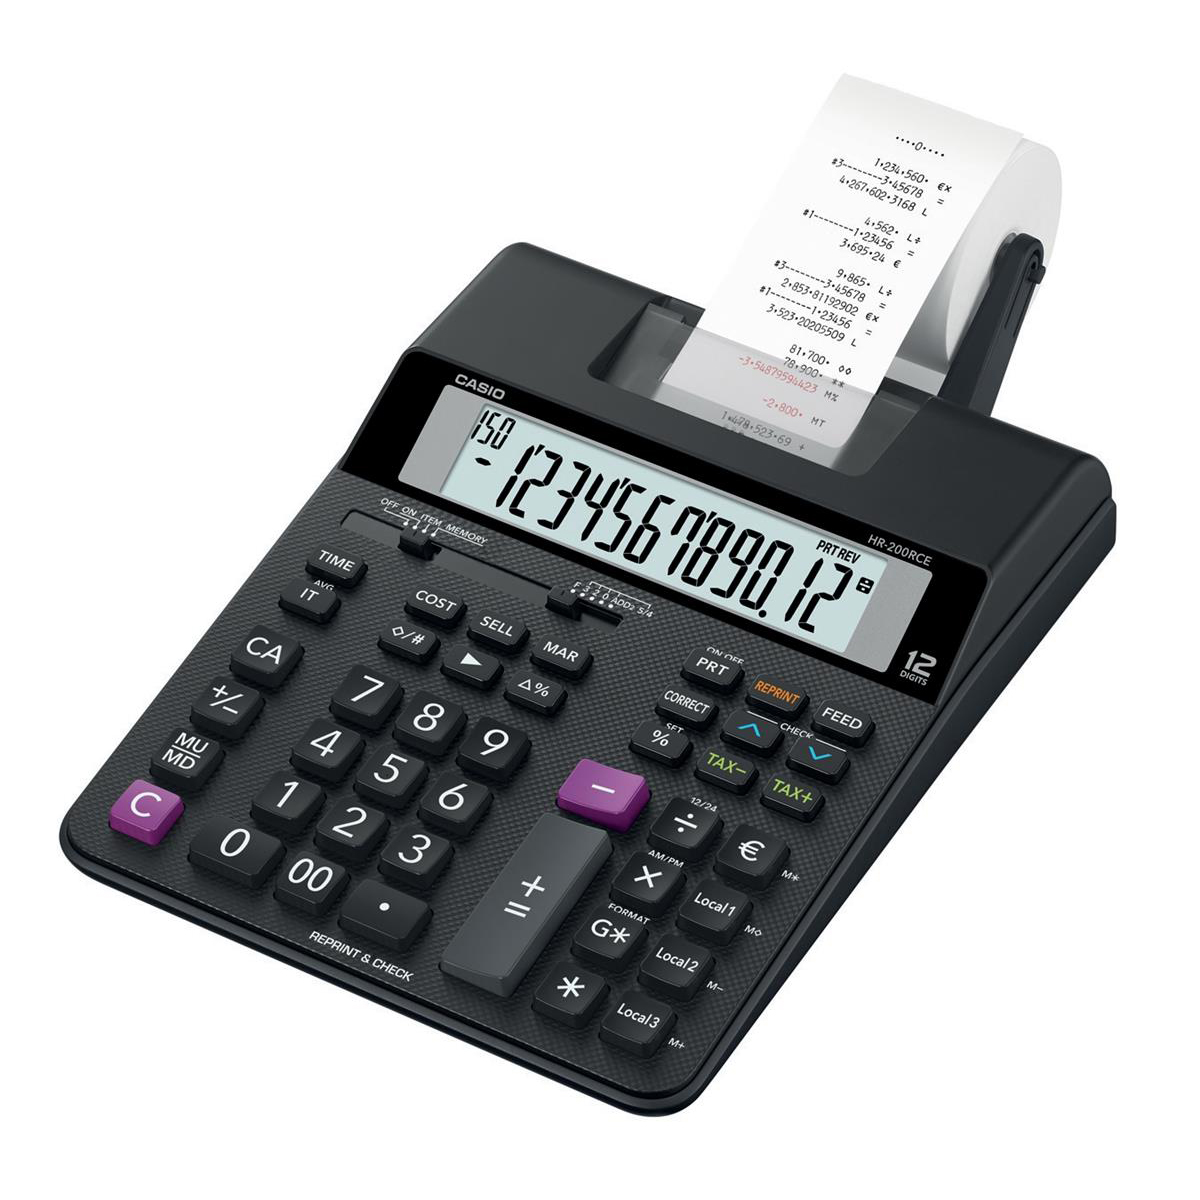 Casio Desktop Printing Calculator 12 Digit Display 2 Colour Printing 195x65x313mm Black Ref HR-200RCE